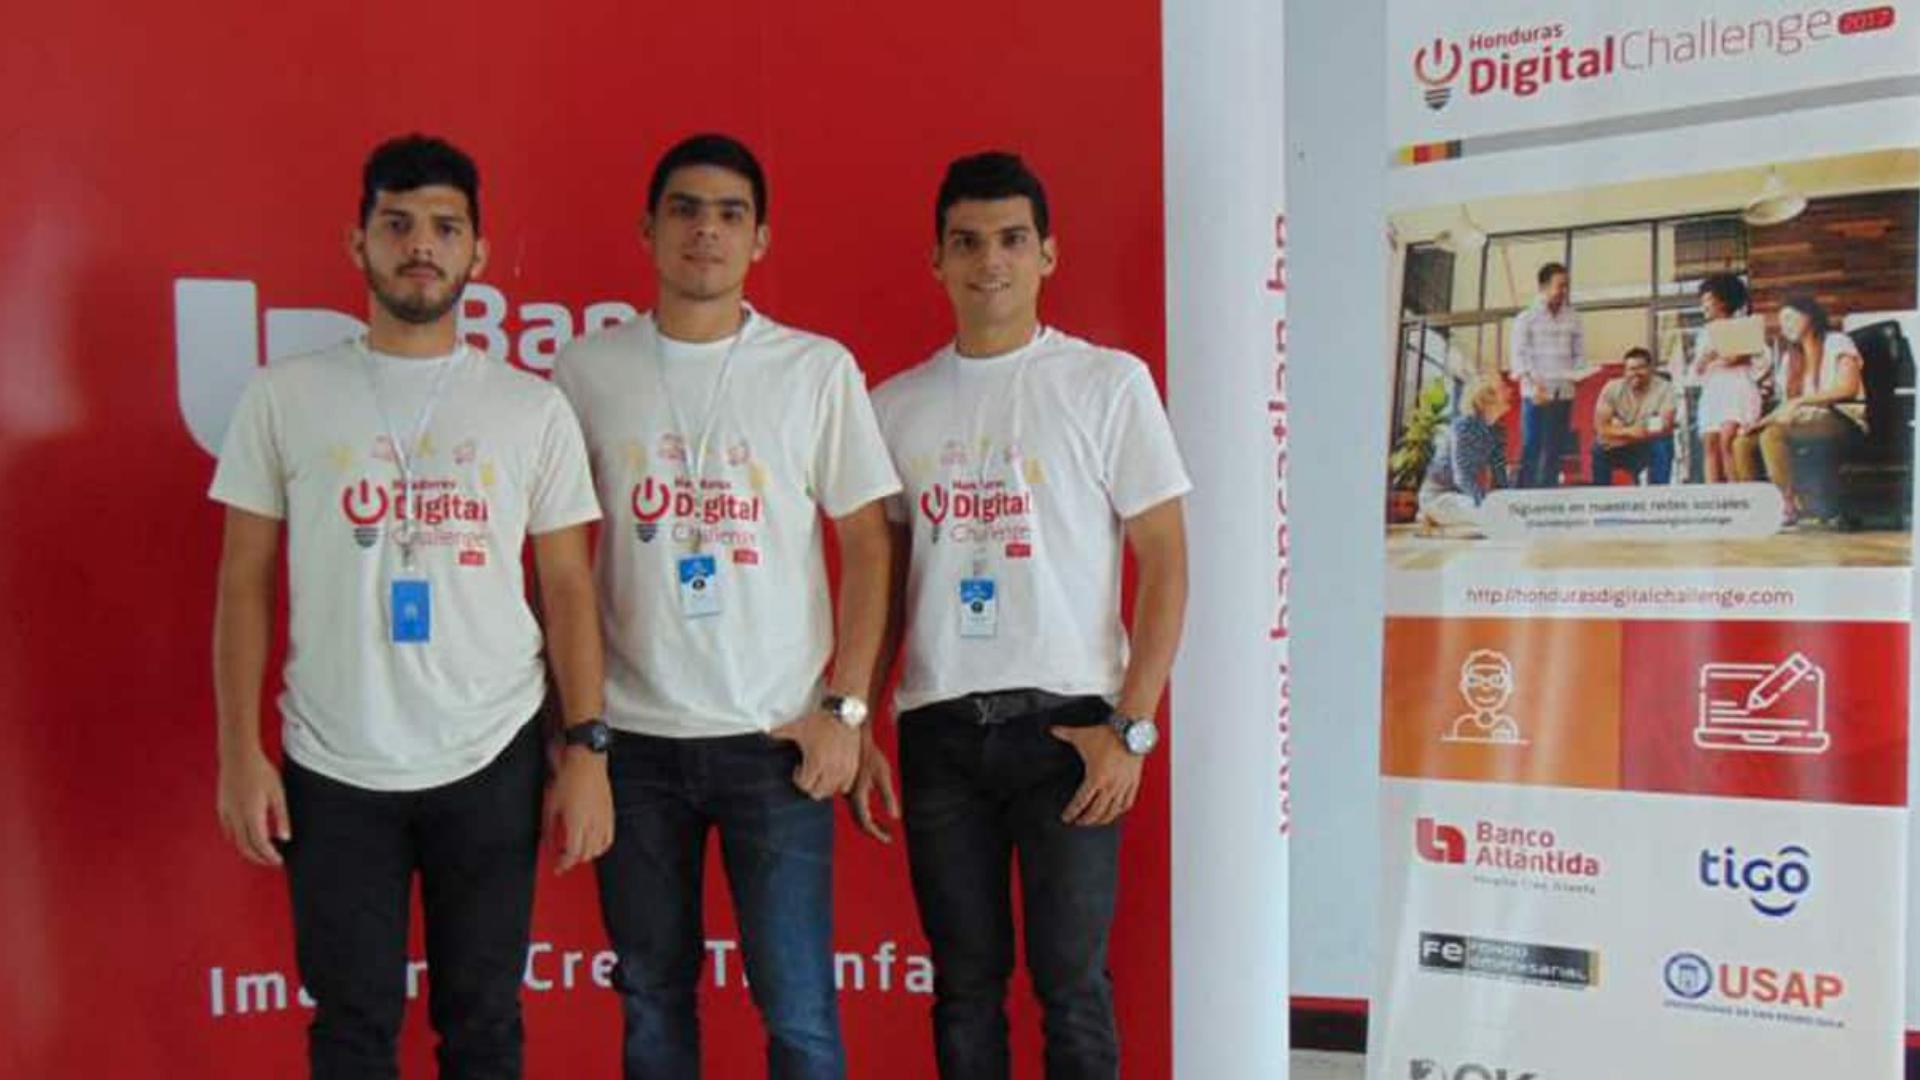 Entrevista a CloudBiz hecha por Honduras Digital Challenge